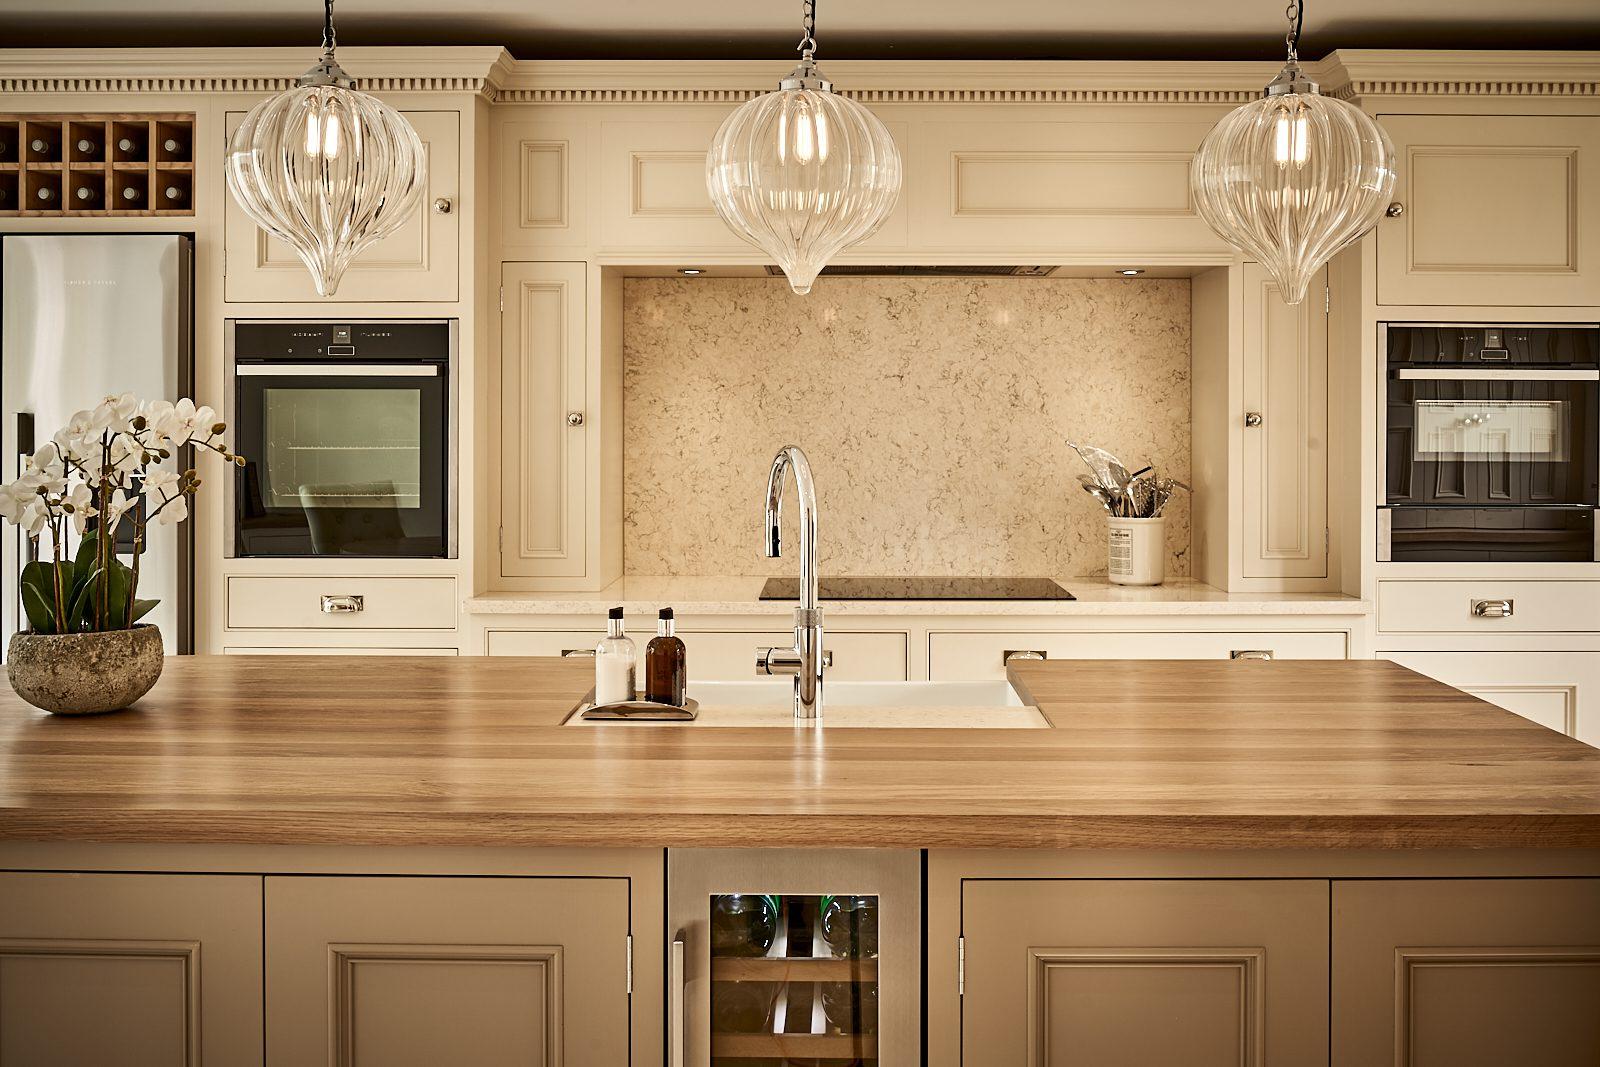 Furniture from bespoke luxury kitchen company - Hill Farm Furniture